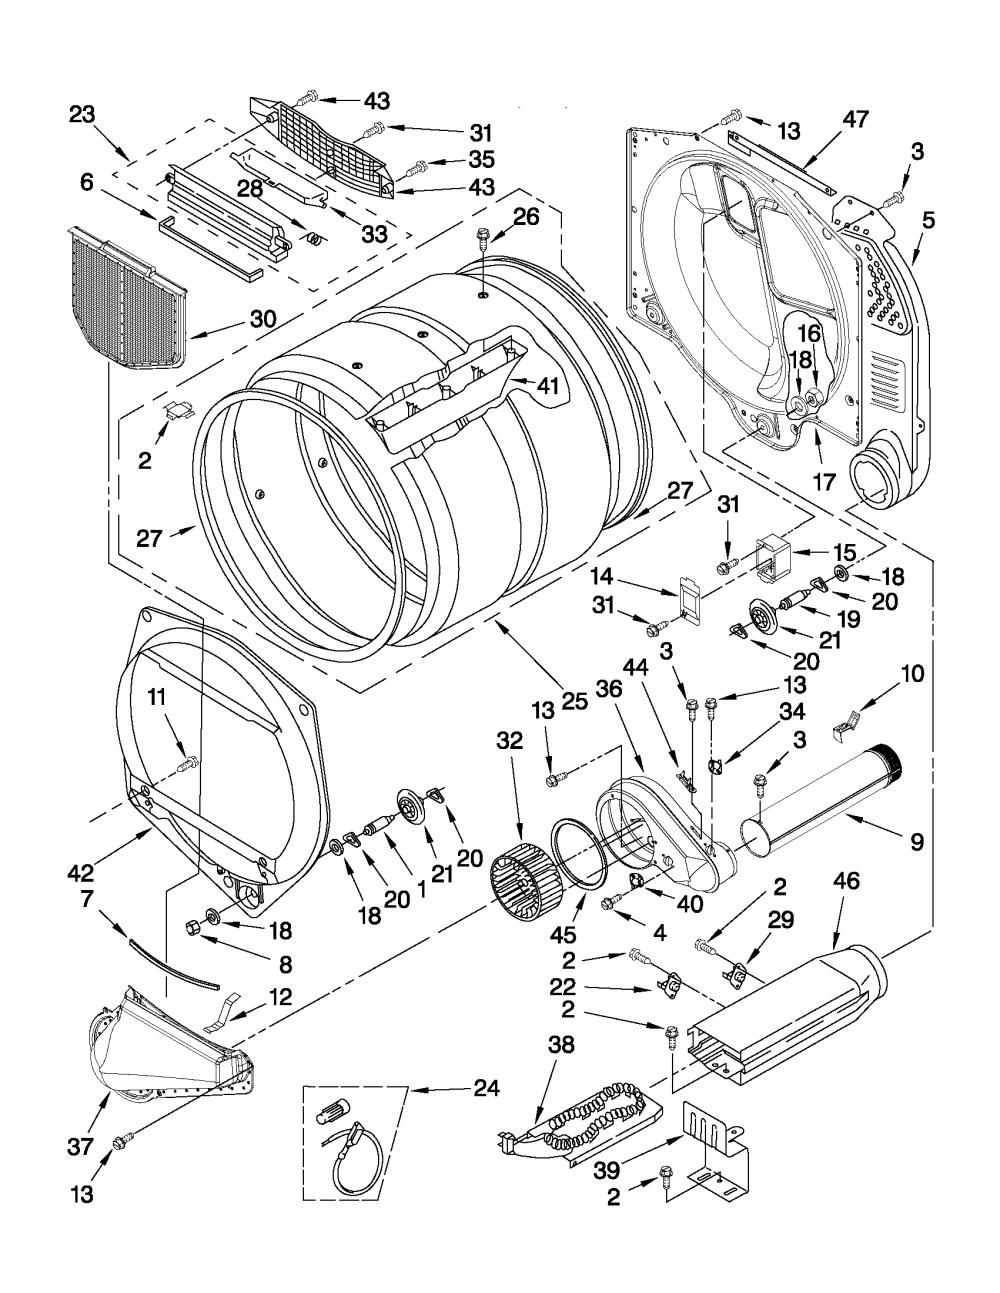 medium resolution of model wiring whirlpool diagram dryer ler7646aw2 wiring